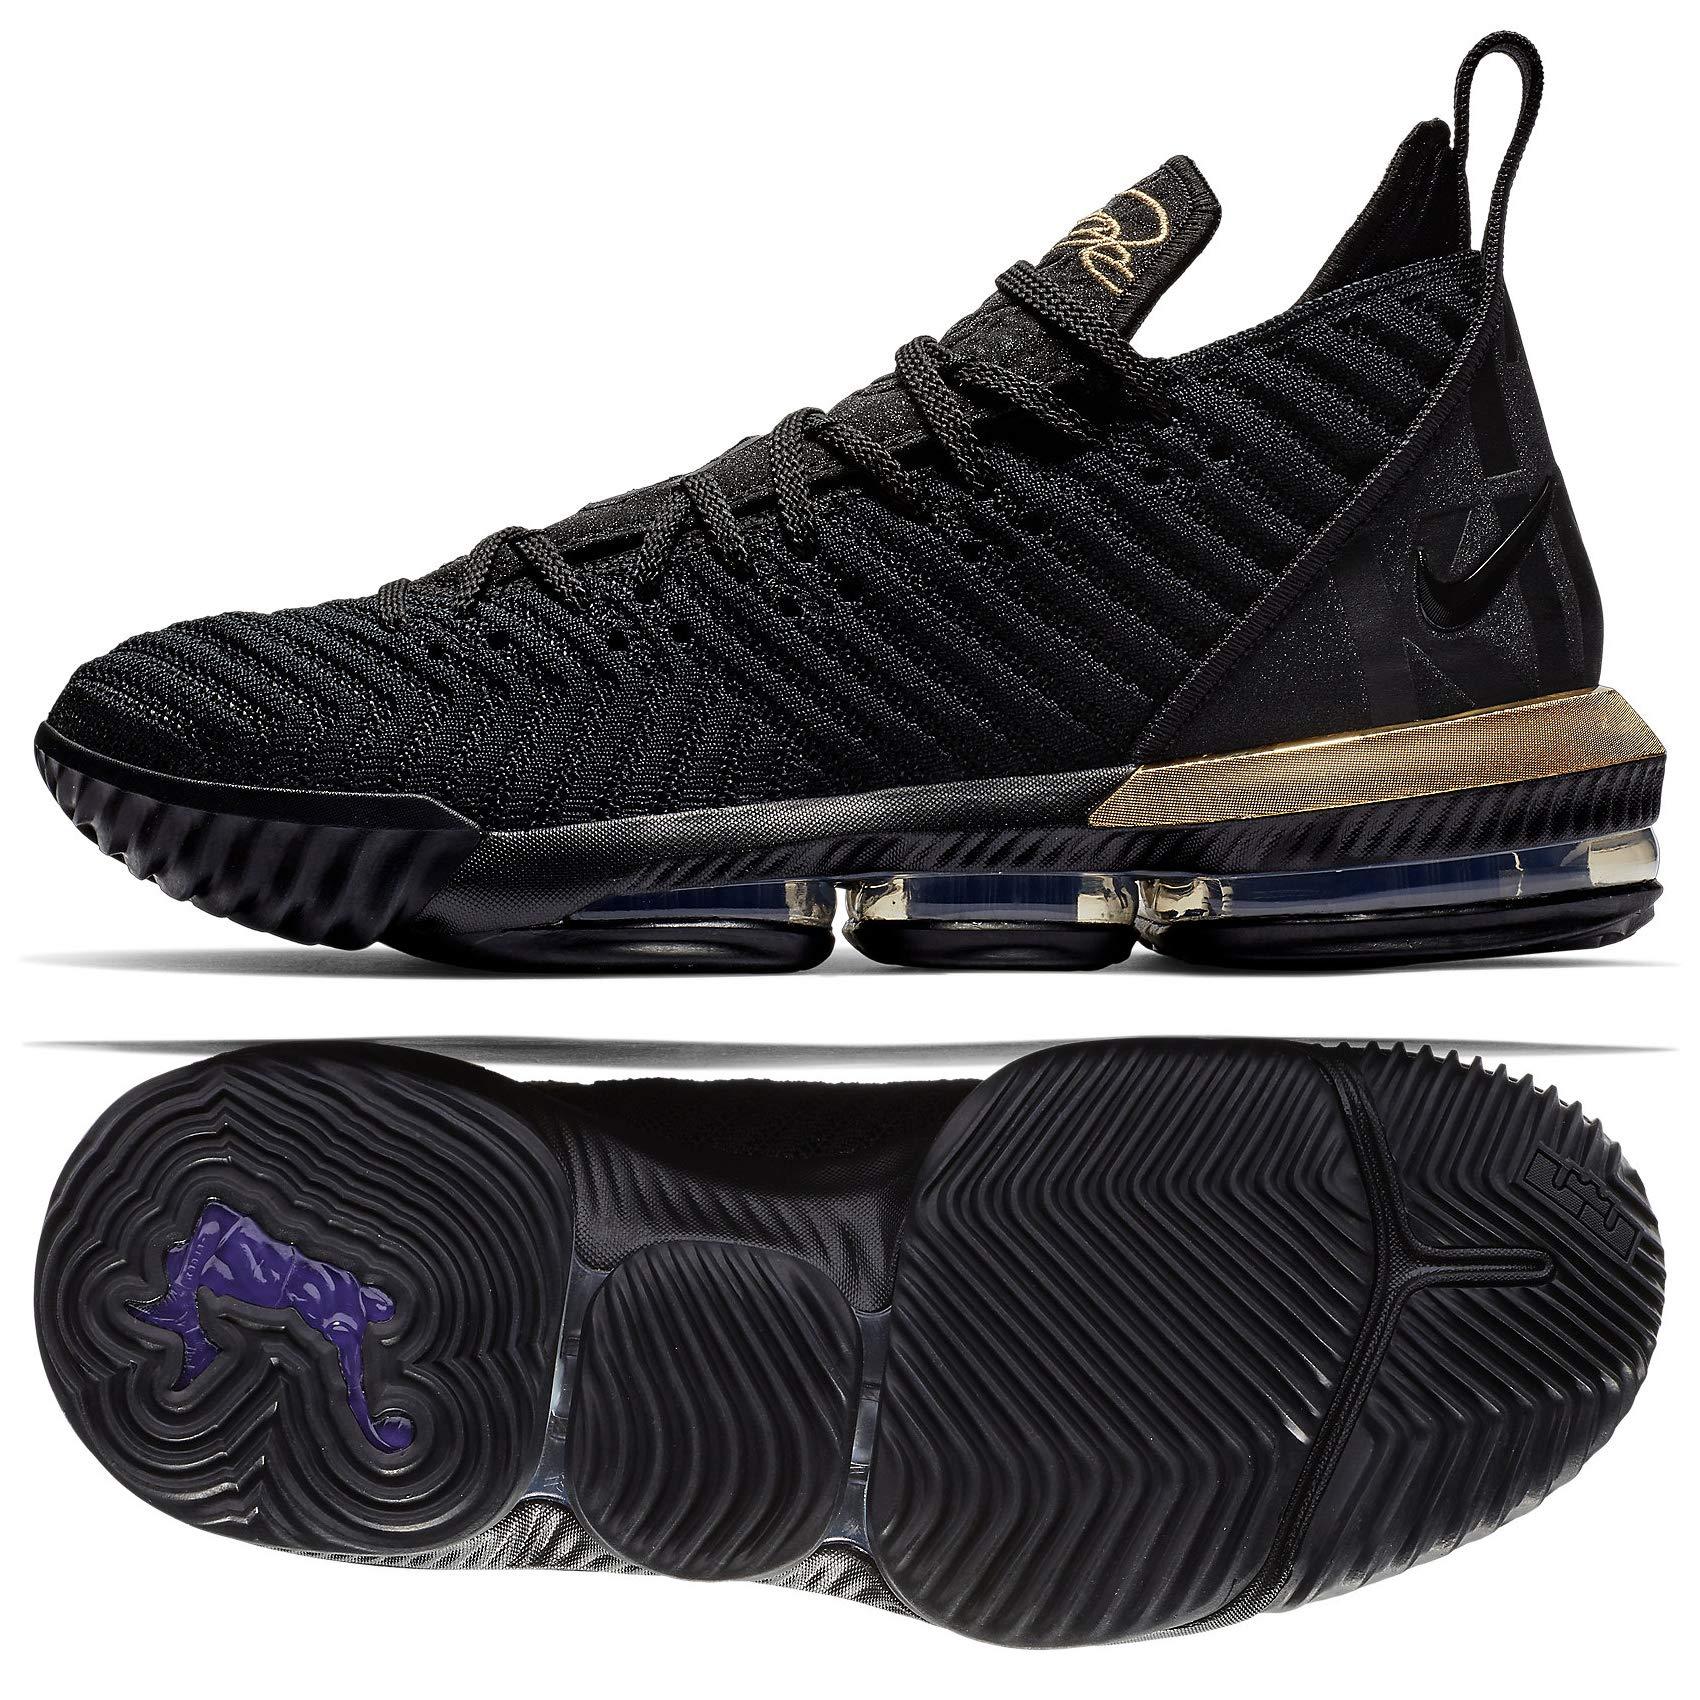 separation shoes 0e911 2f1ff Nike Mens Lebron 16 Basketball Shoes (Black/Metallic Gold, 11 D(M) US)